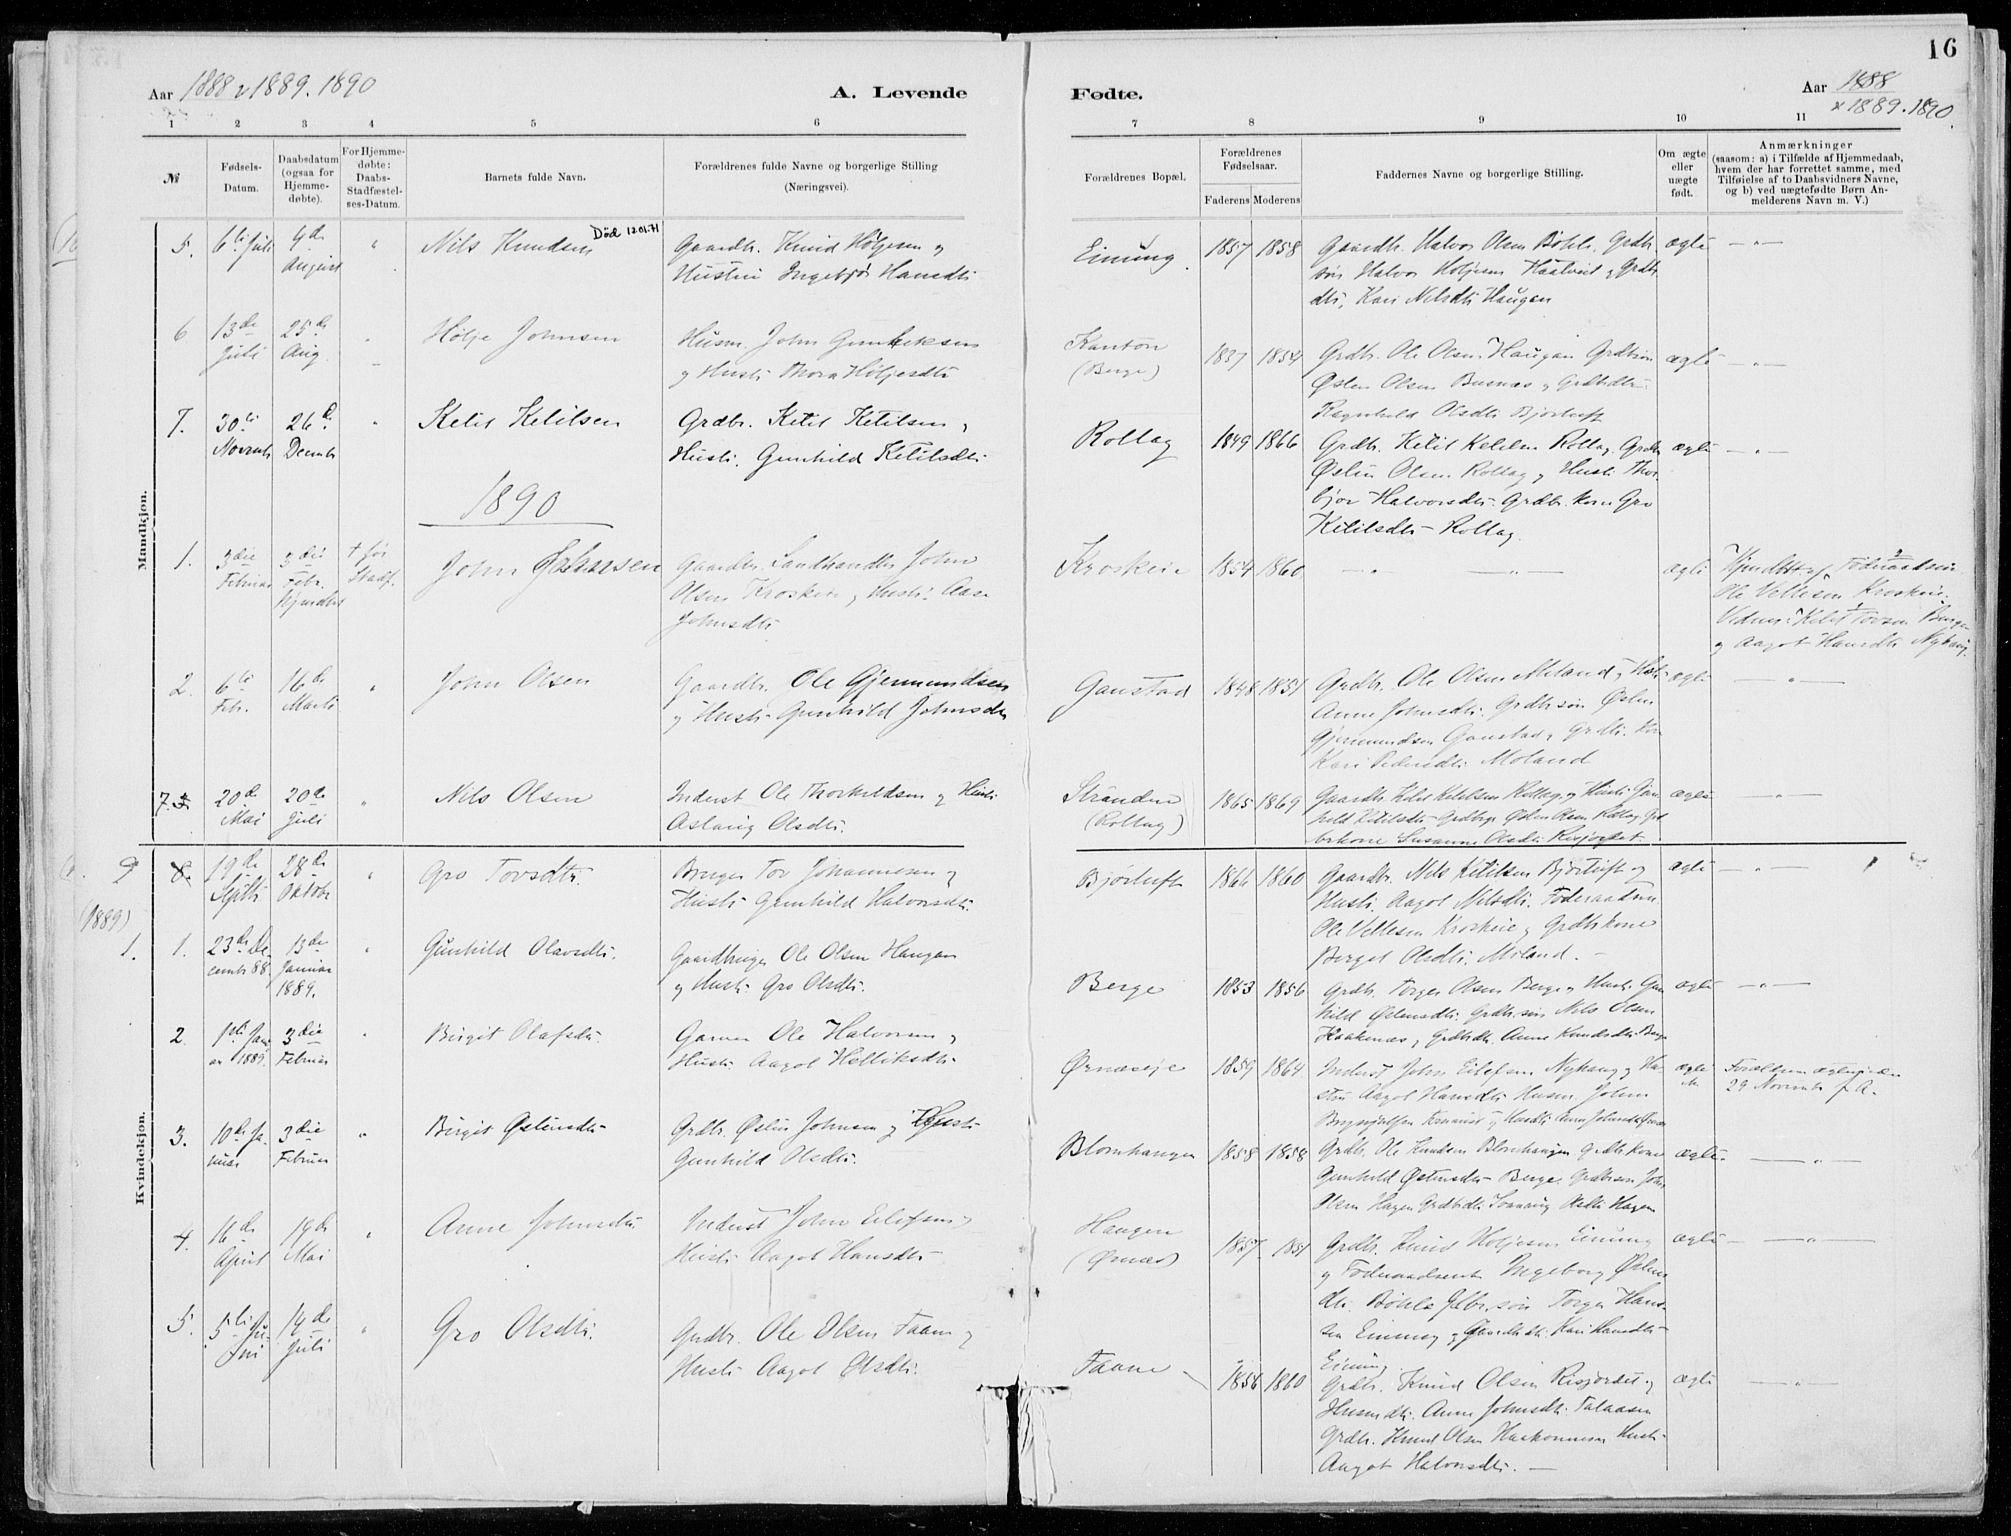 SAKO, Tinn kirkebøker, F/Fb/L0002: Ministerialbok nr. II 2, 1878-1917, s. 16